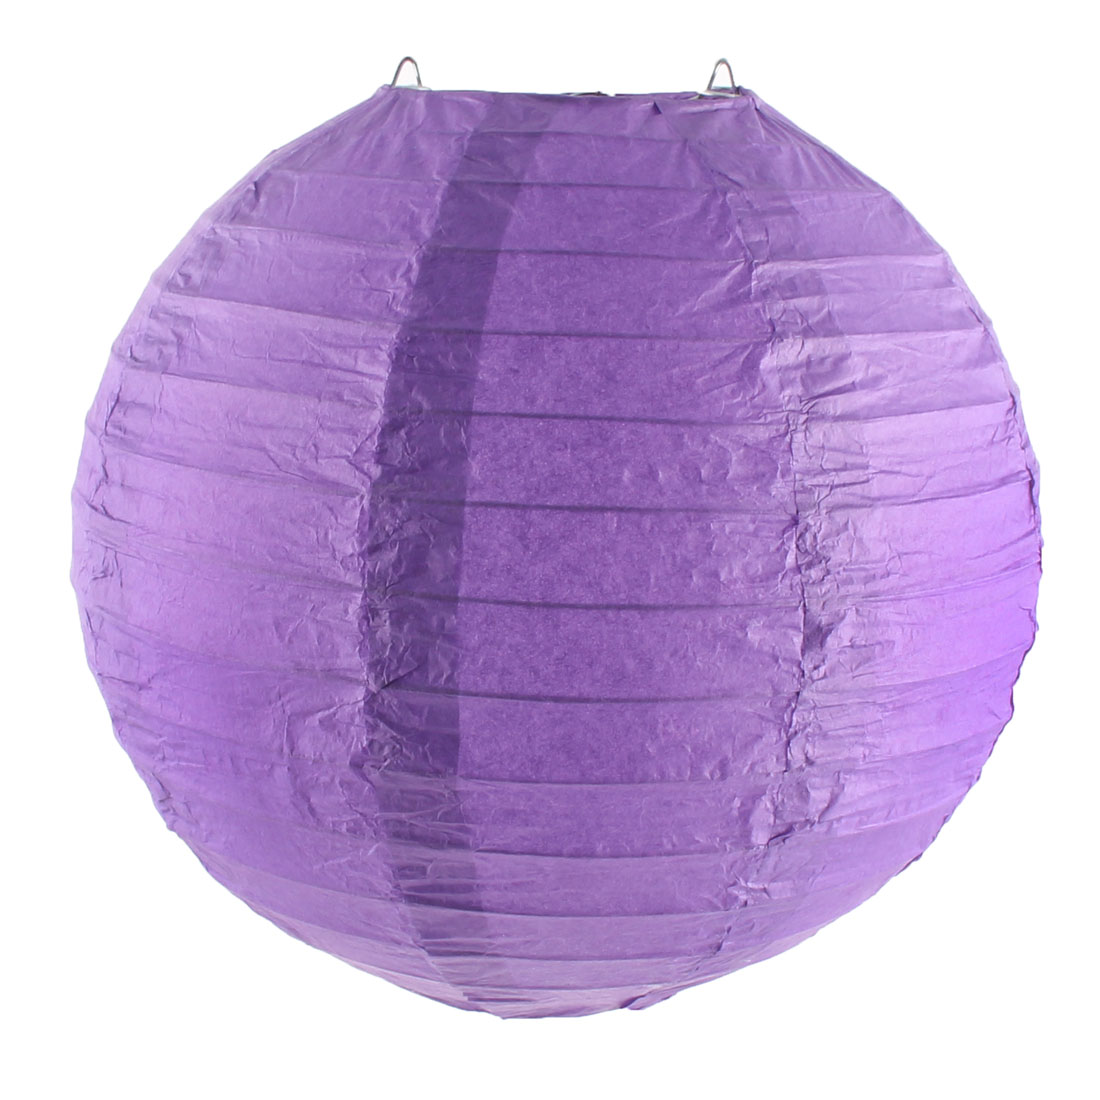 Christmas Paper Lantern Handmade String Light Decoration Purple 8 Inches